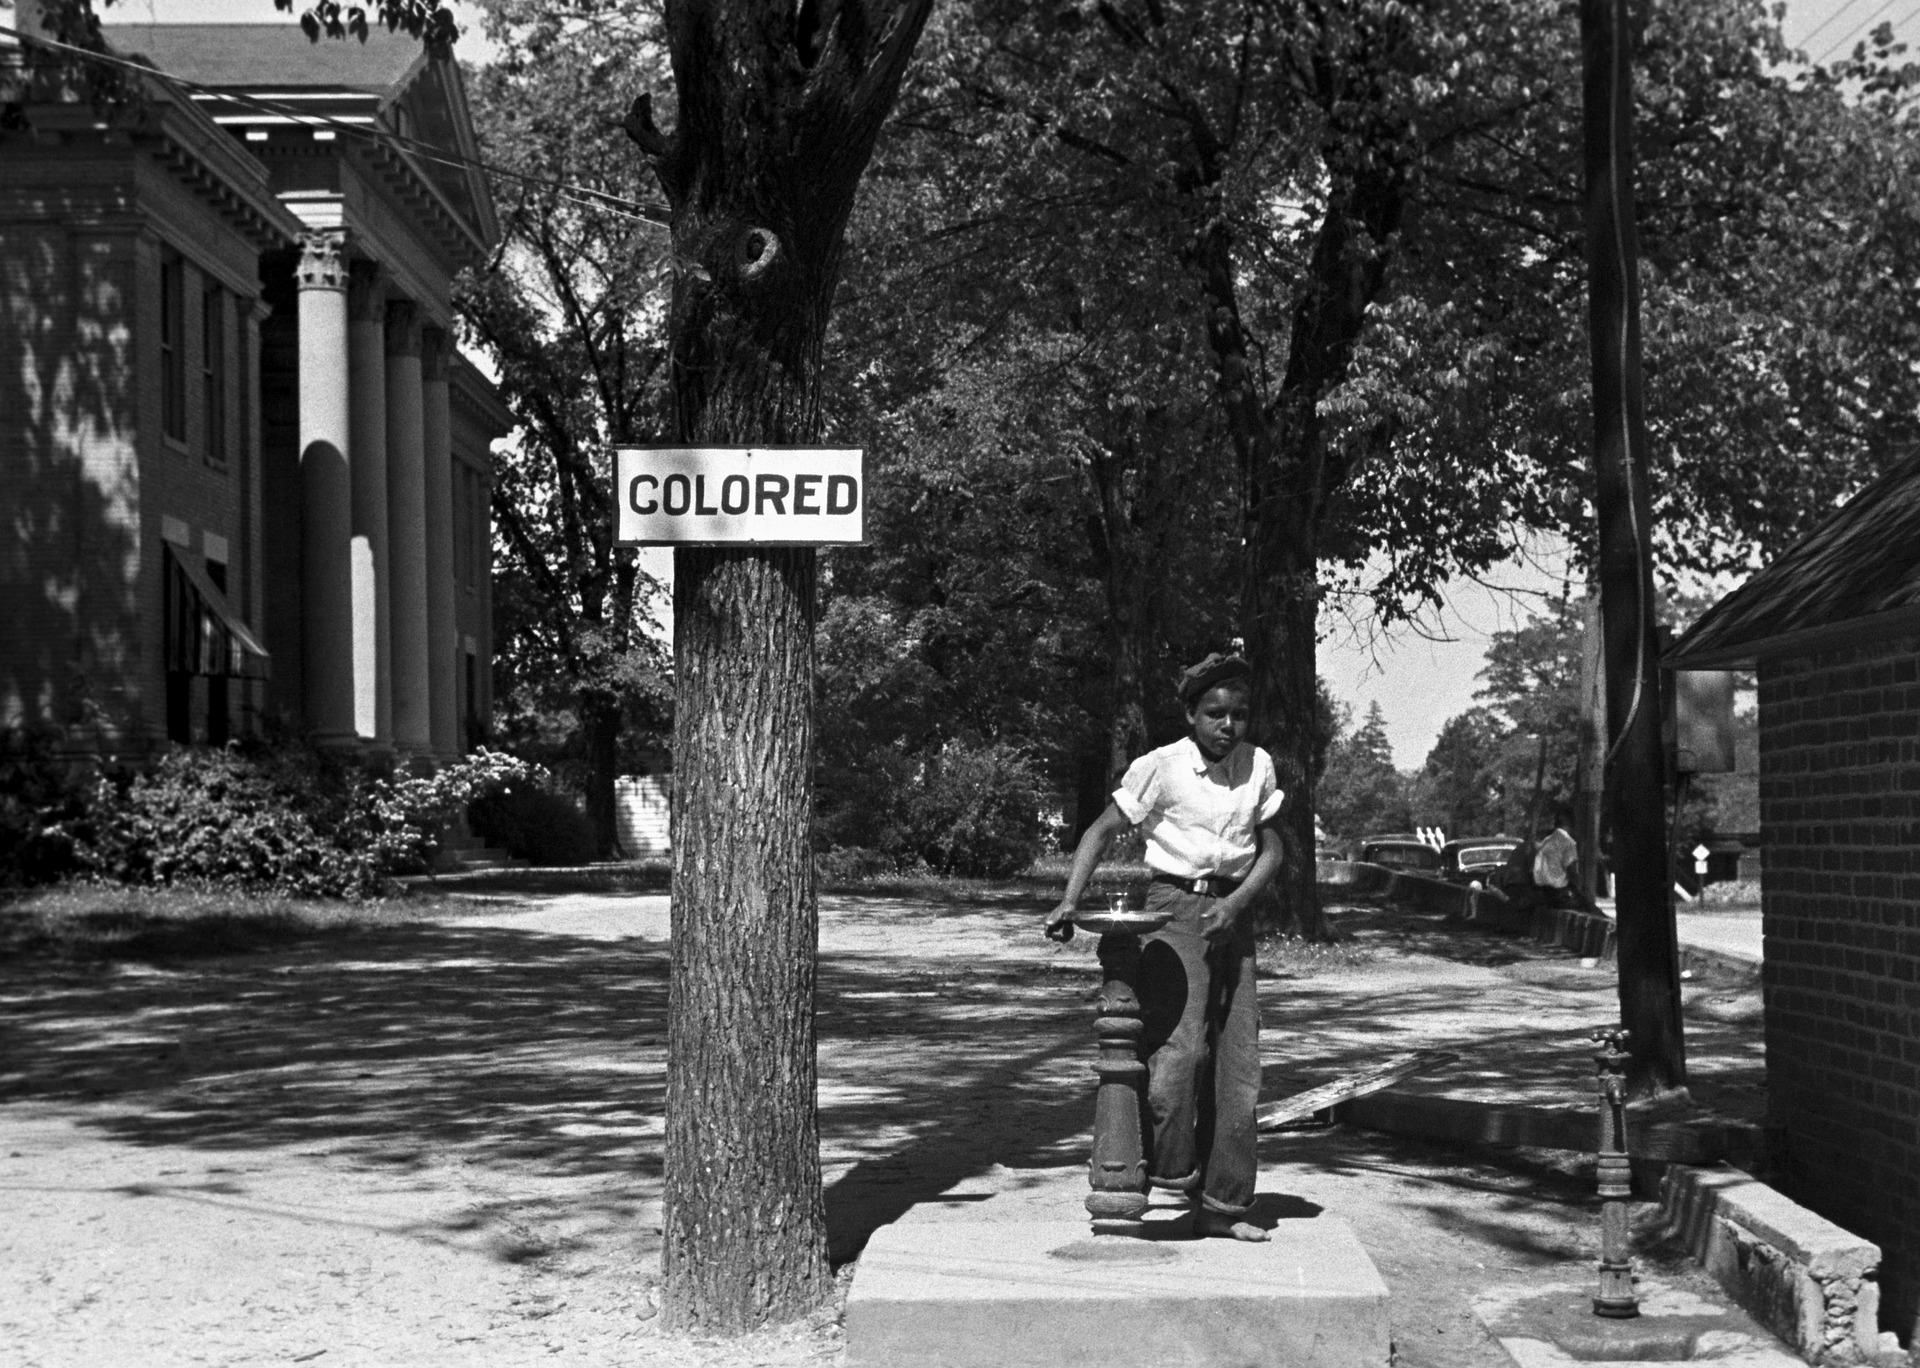 racial-segregation-67692_1920.jpg